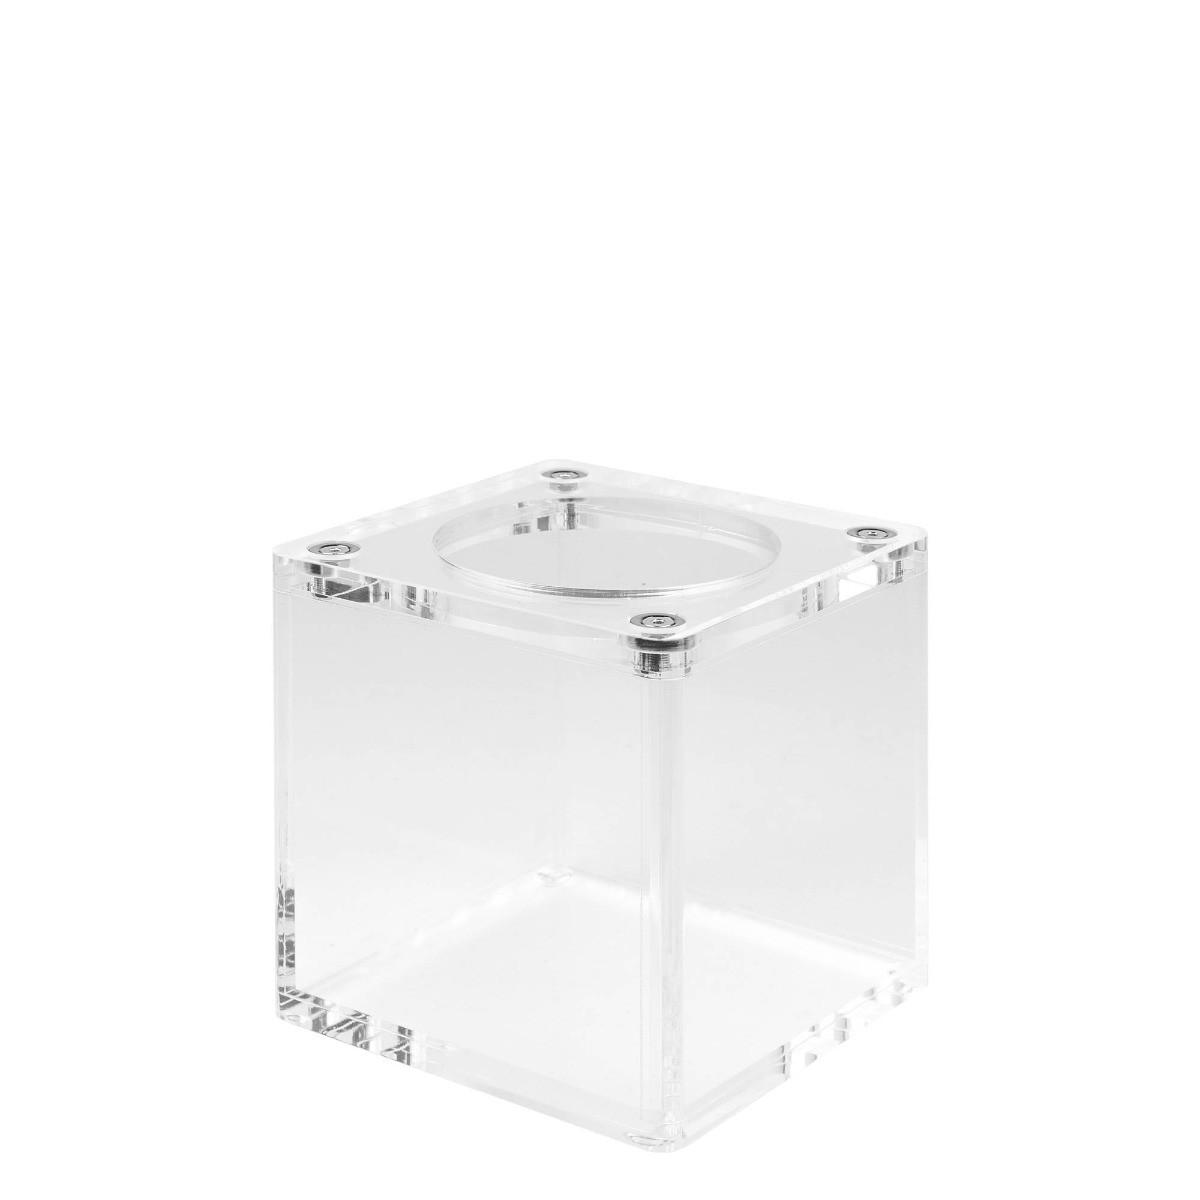 Hoob Cube Mini